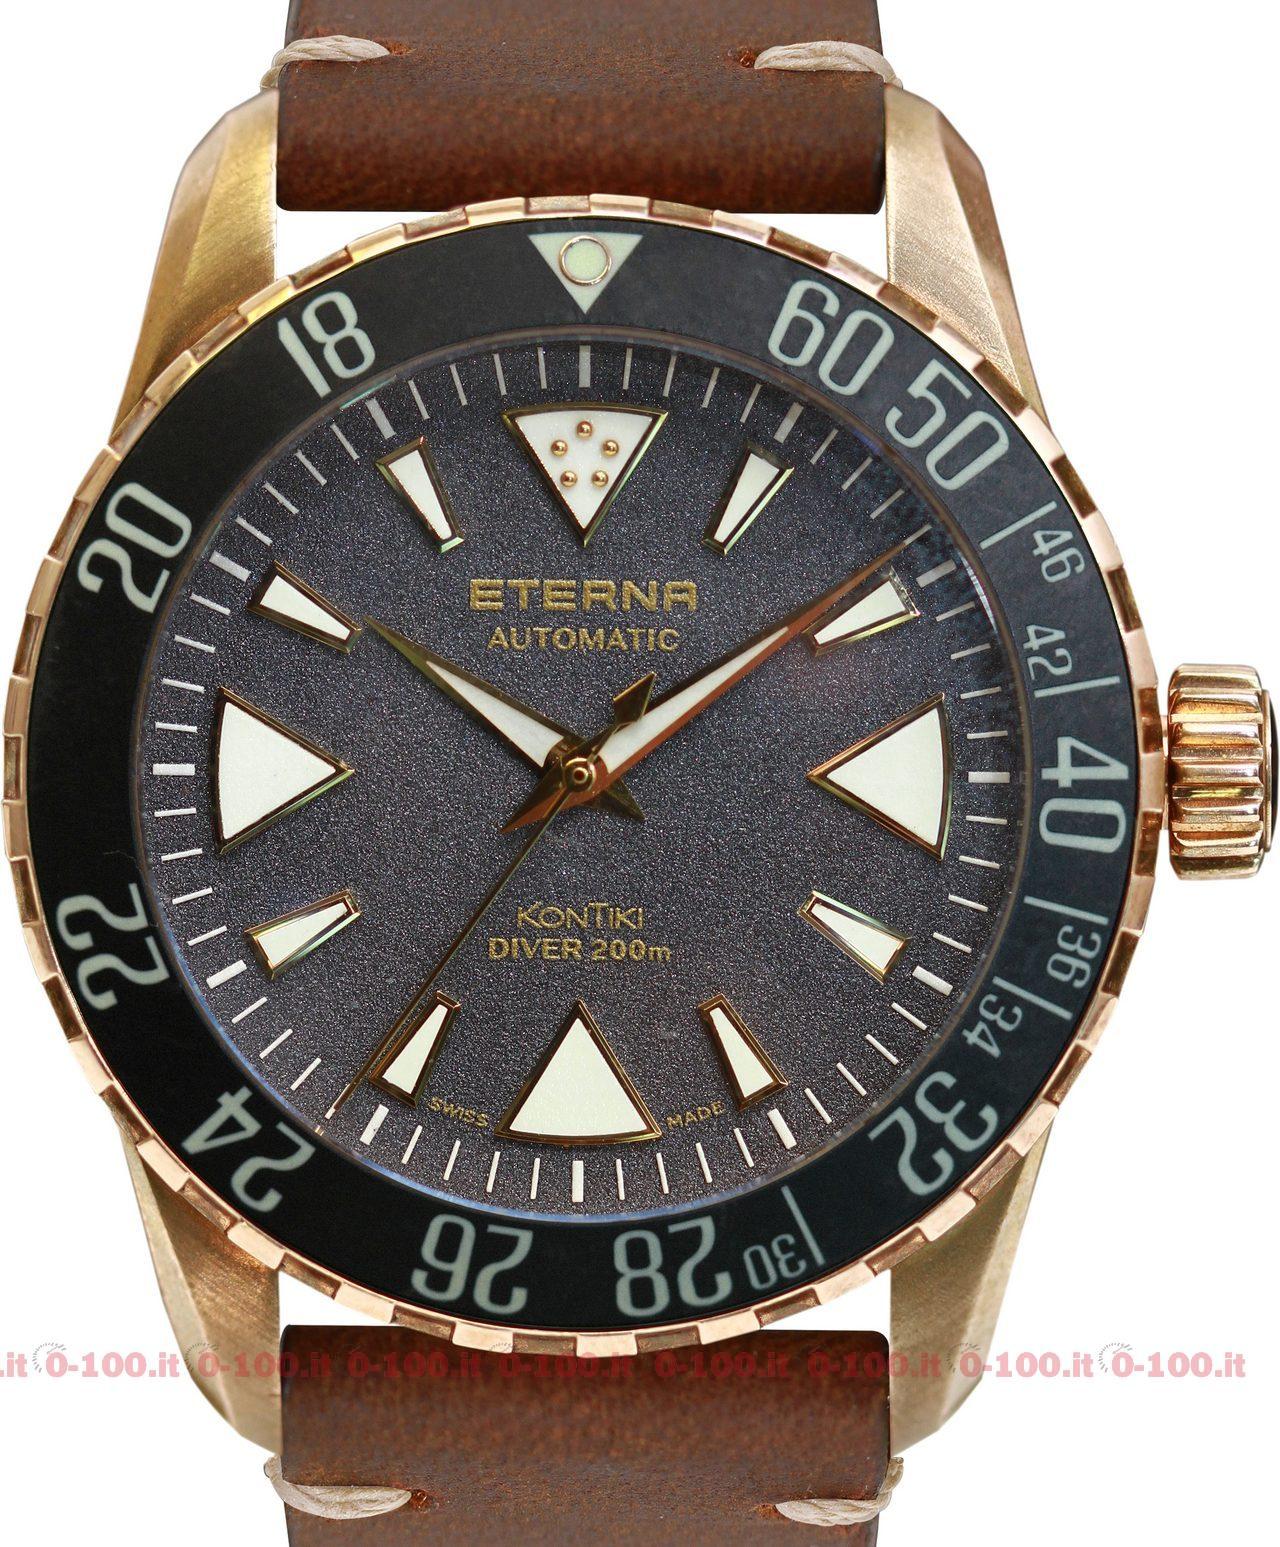 anteprima-baselworld-2017-eterna-kontiki-bronze-manufacture-limited-edition-ref-1291-78-49-1422-prezzo-price_0-1005